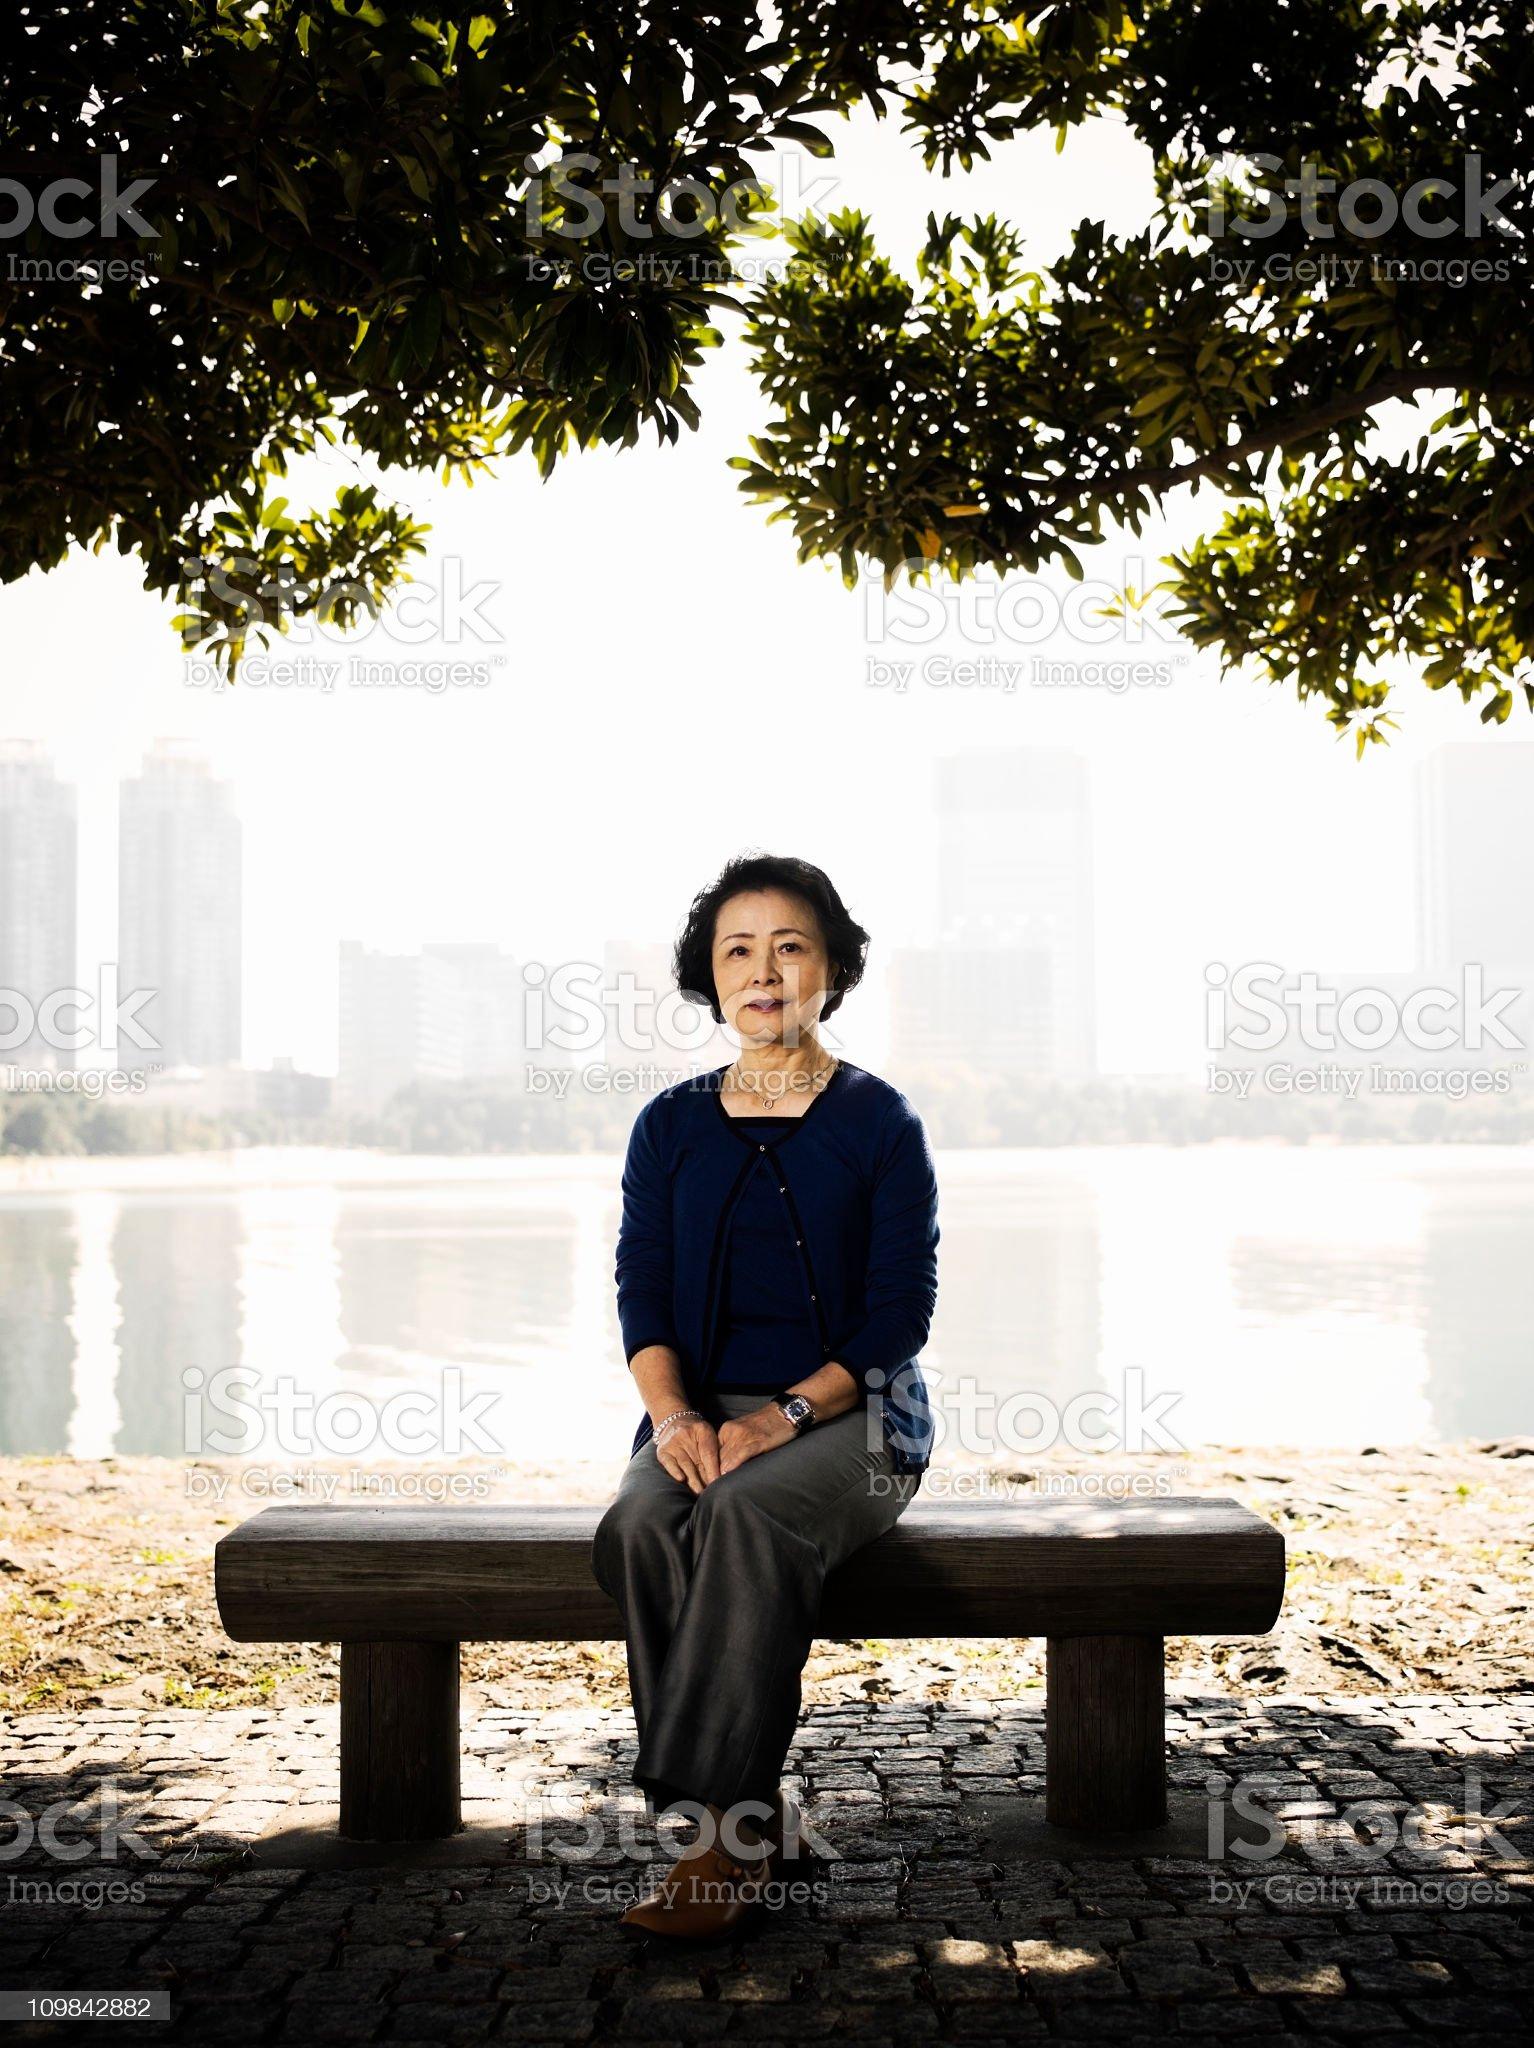 Senior Woman Sitting on a Park Bench royalty-free stock photo